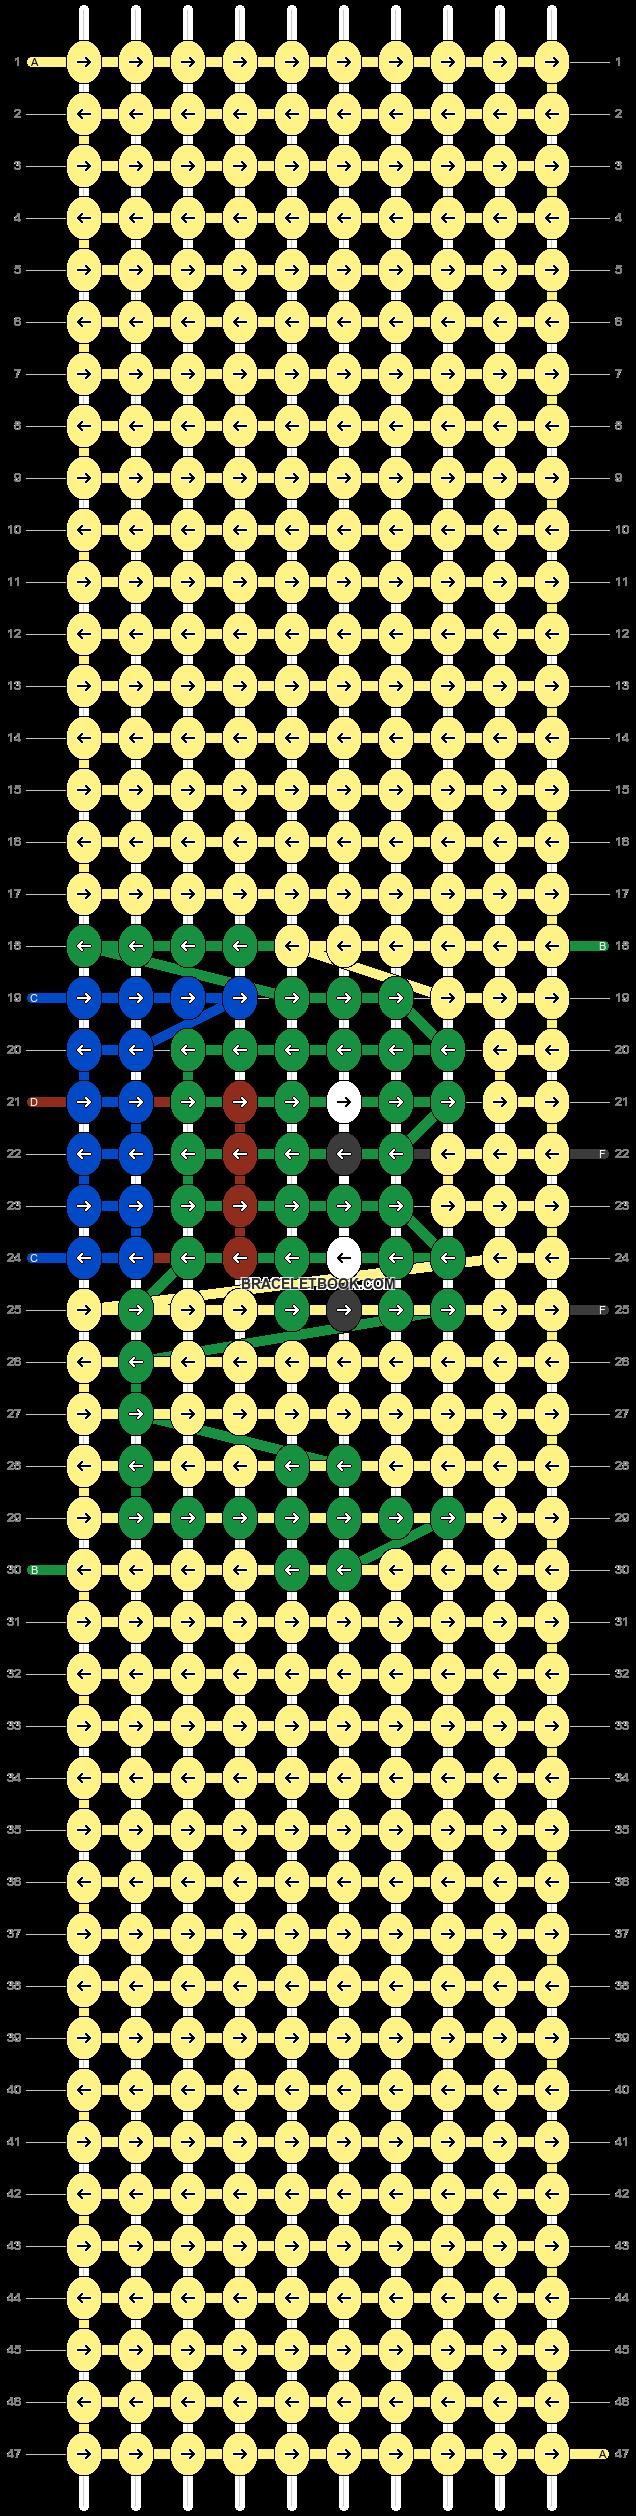 Alpha pattern #43489 pattern